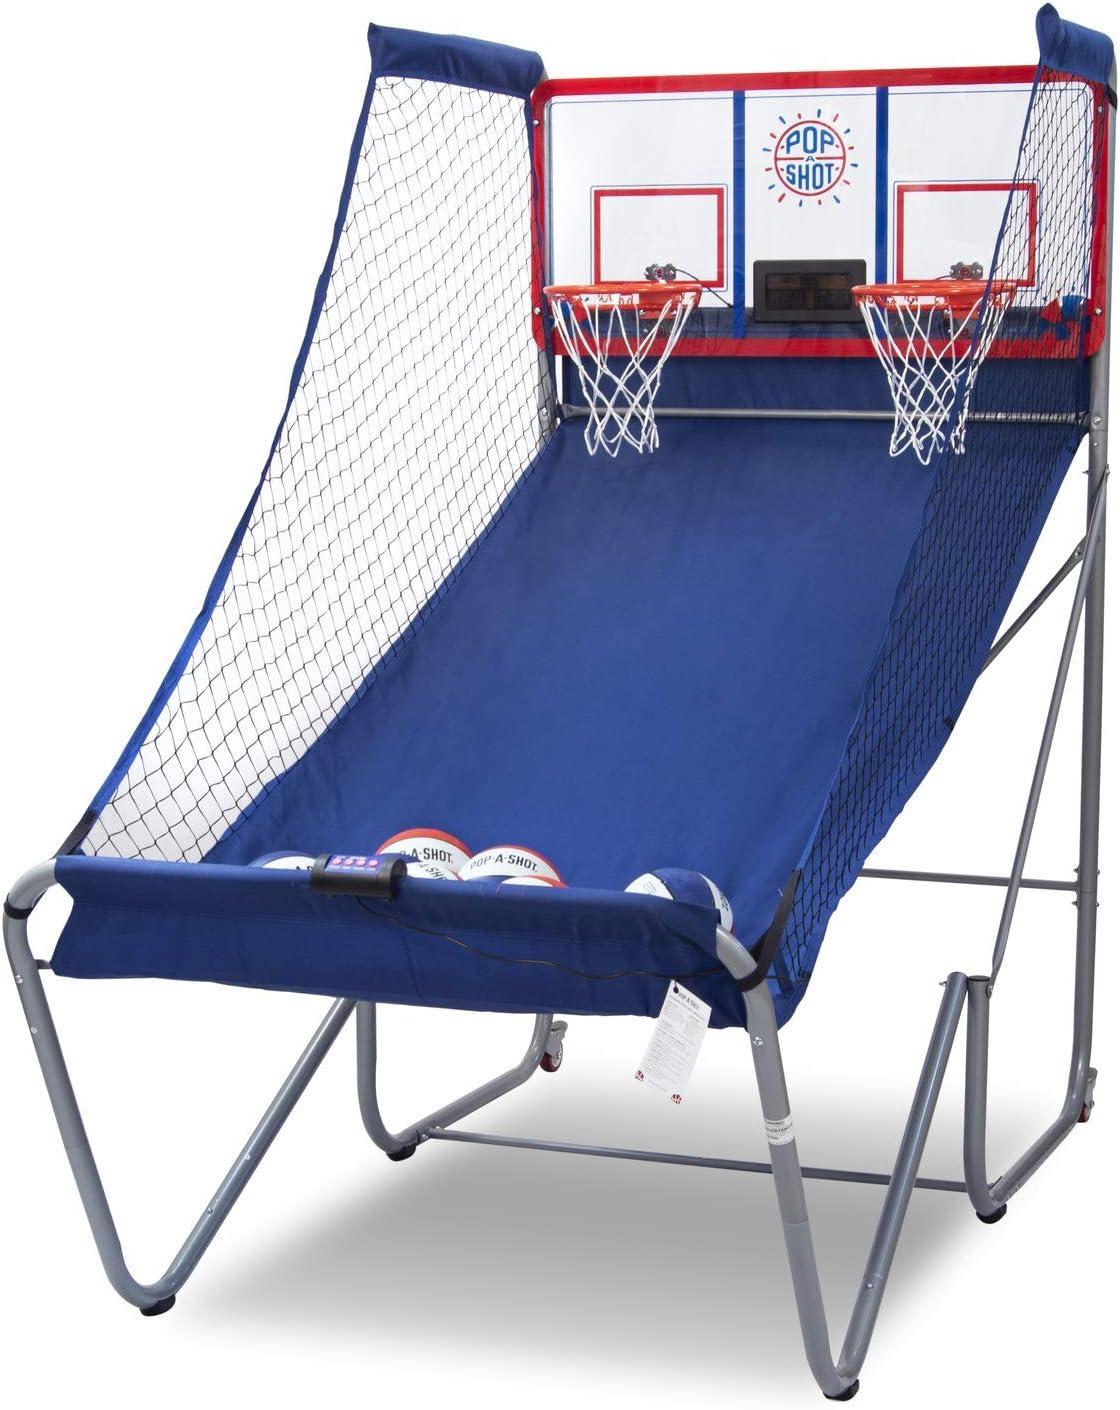 Pop-A-Shot Home Dual Shot Basketball Arcade Game for sale online